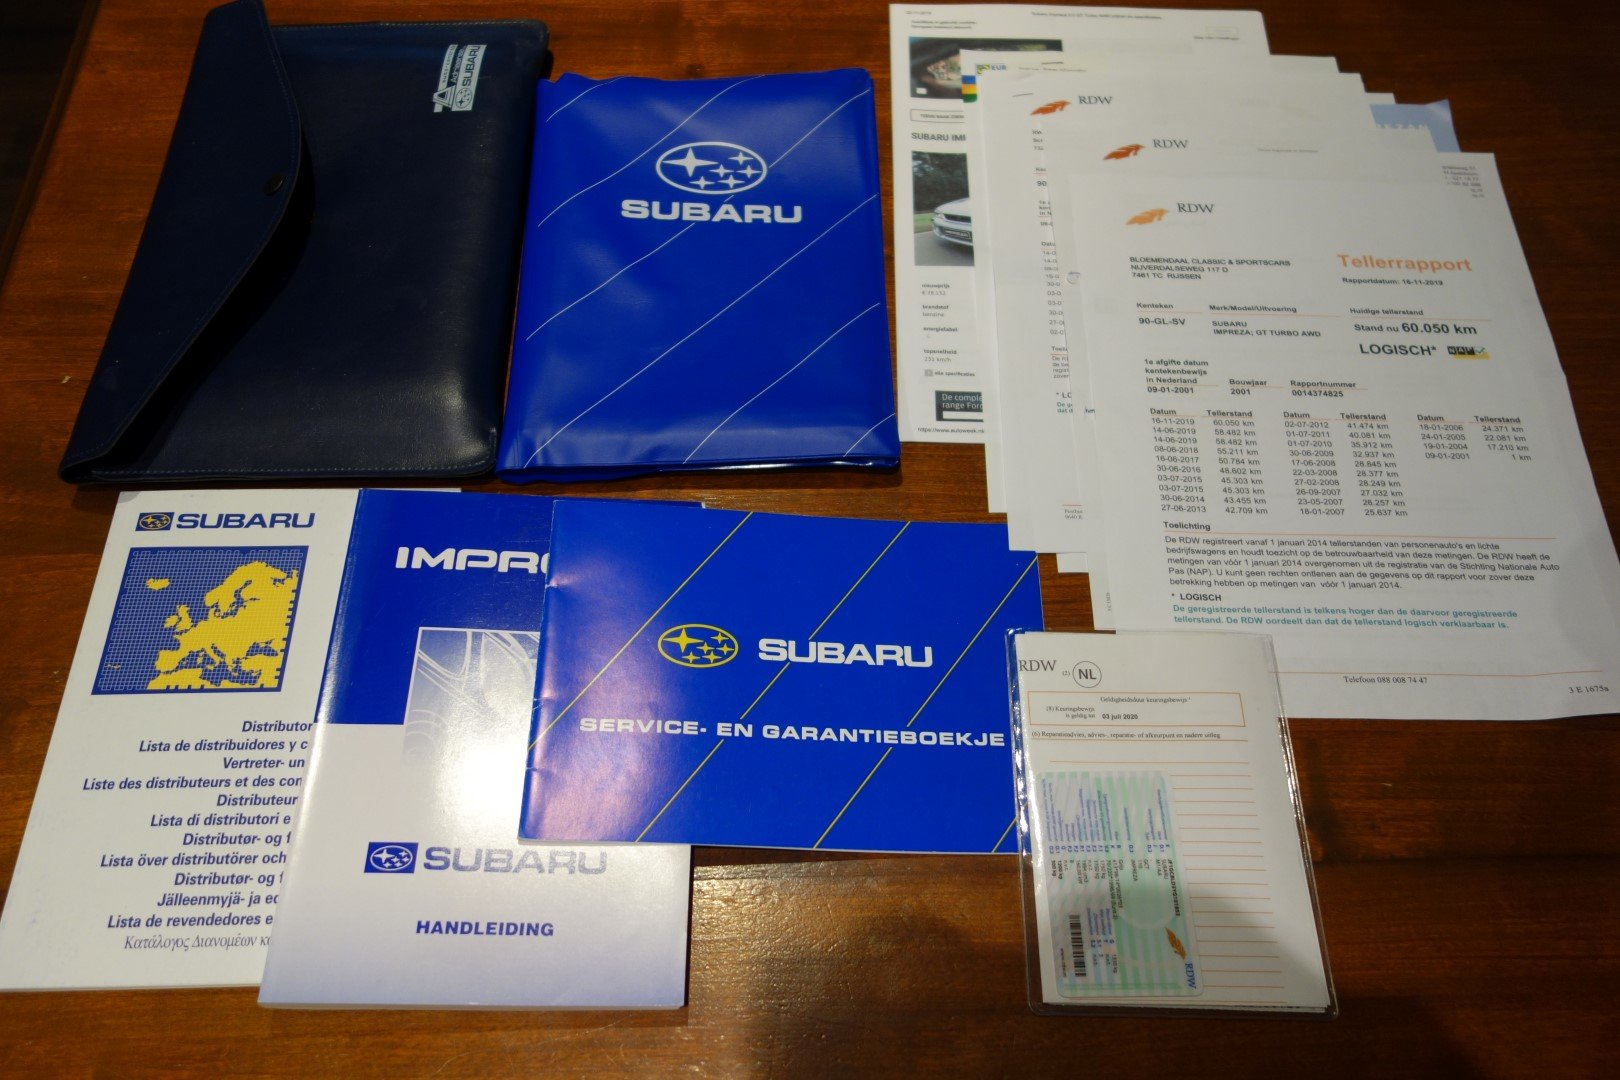 2001 Subaru Impreza 2.0 GT AWD Turbo For Sale (picture 6 of 6)